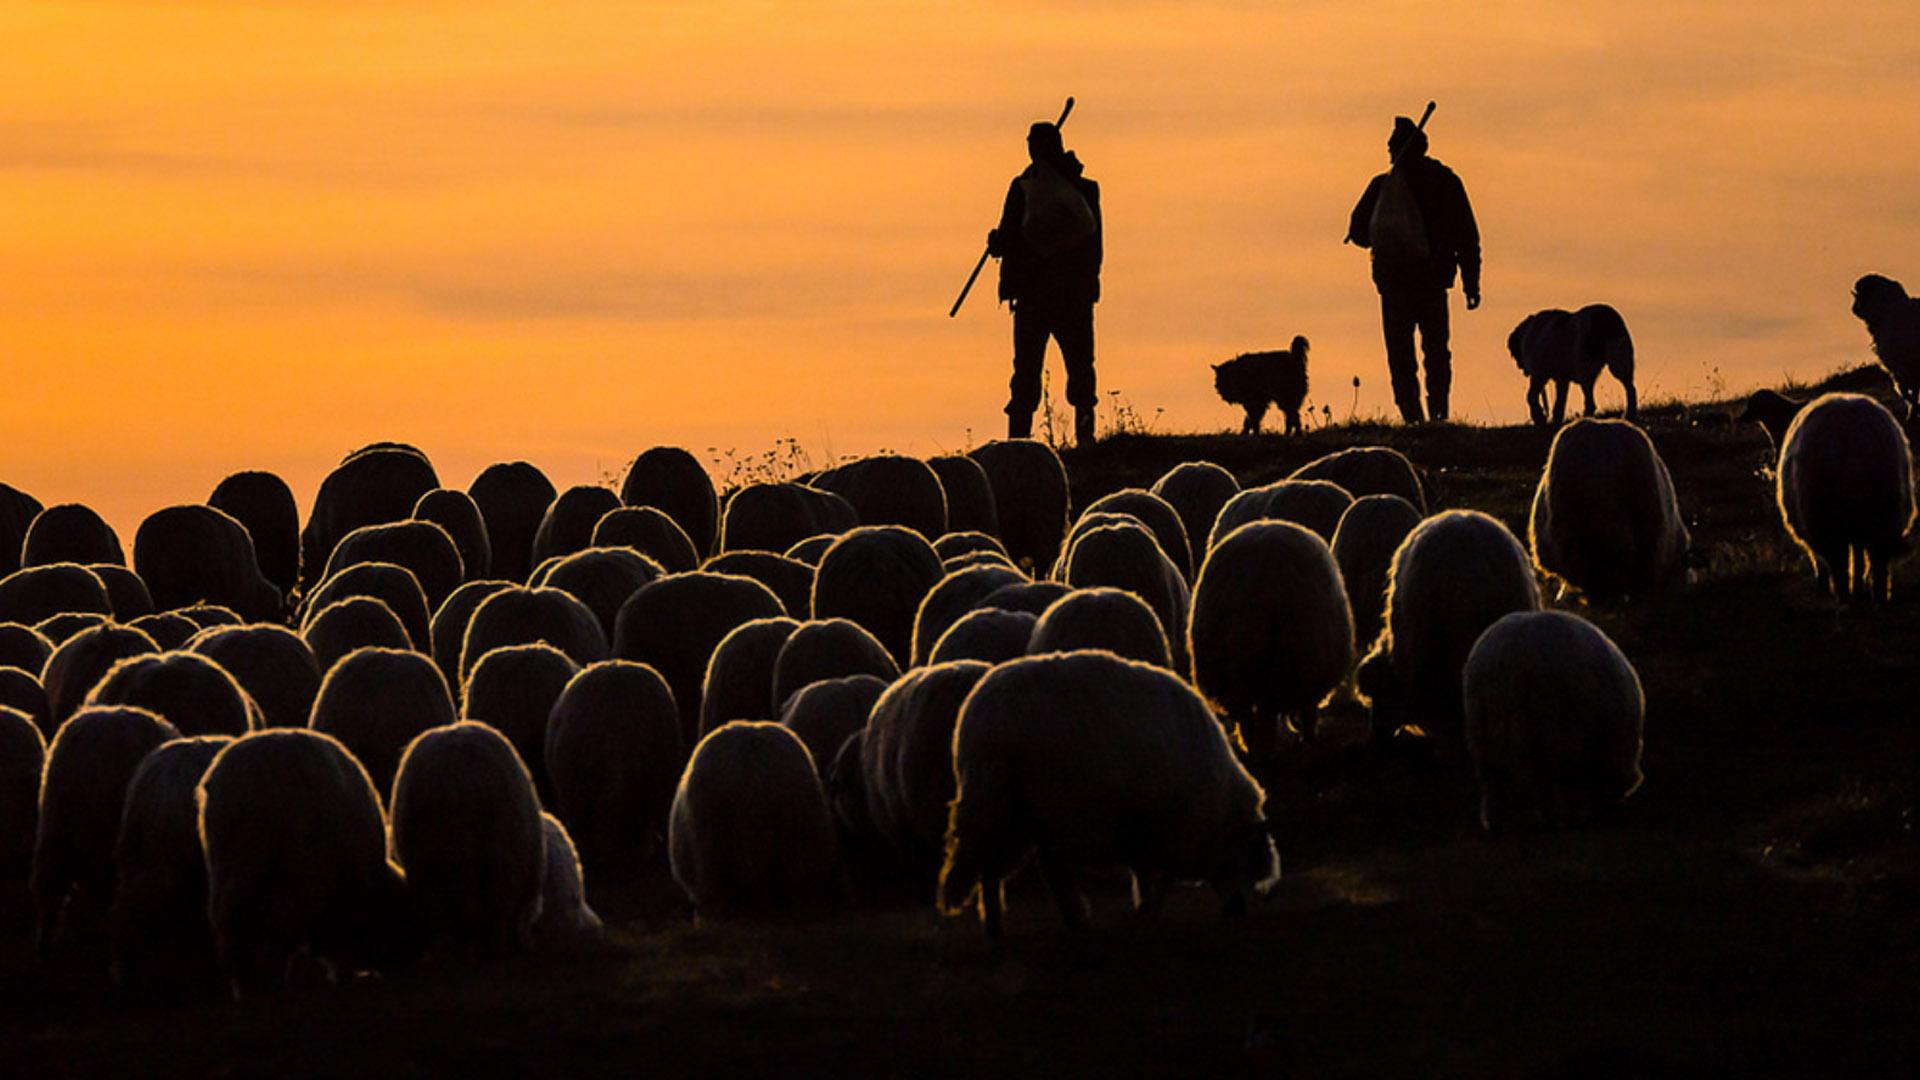 Ryszard Domański Photographer of the Day Travel